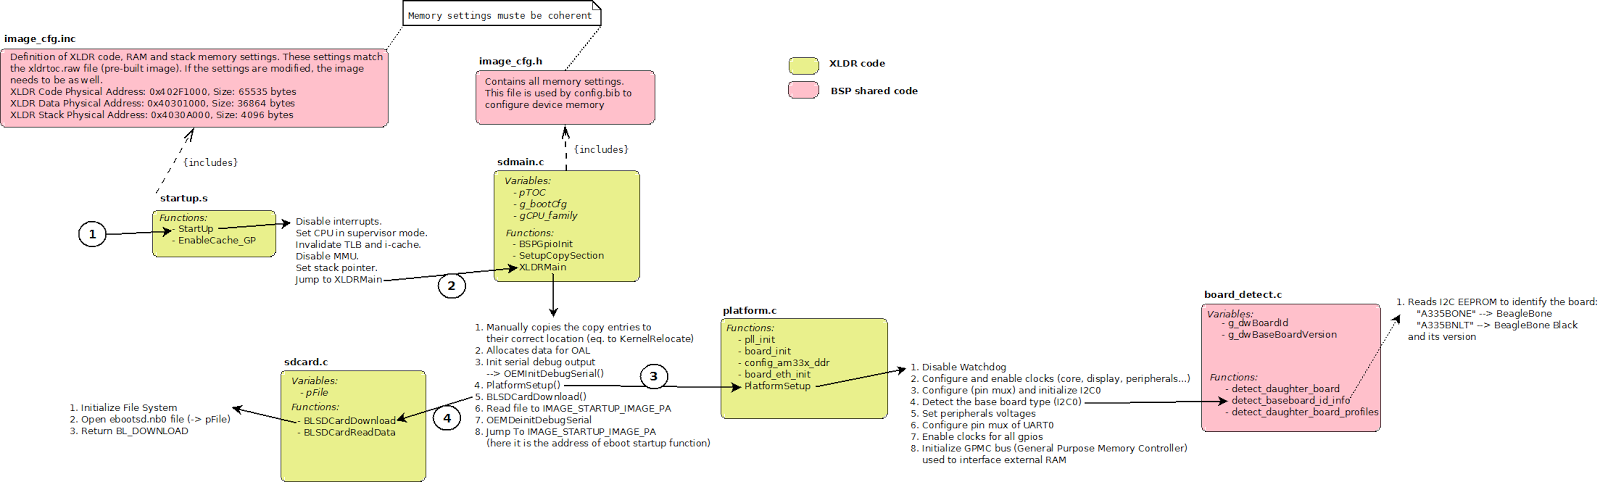 WCE7 : BeagleBone Black boot procedure ~ A developer's log book